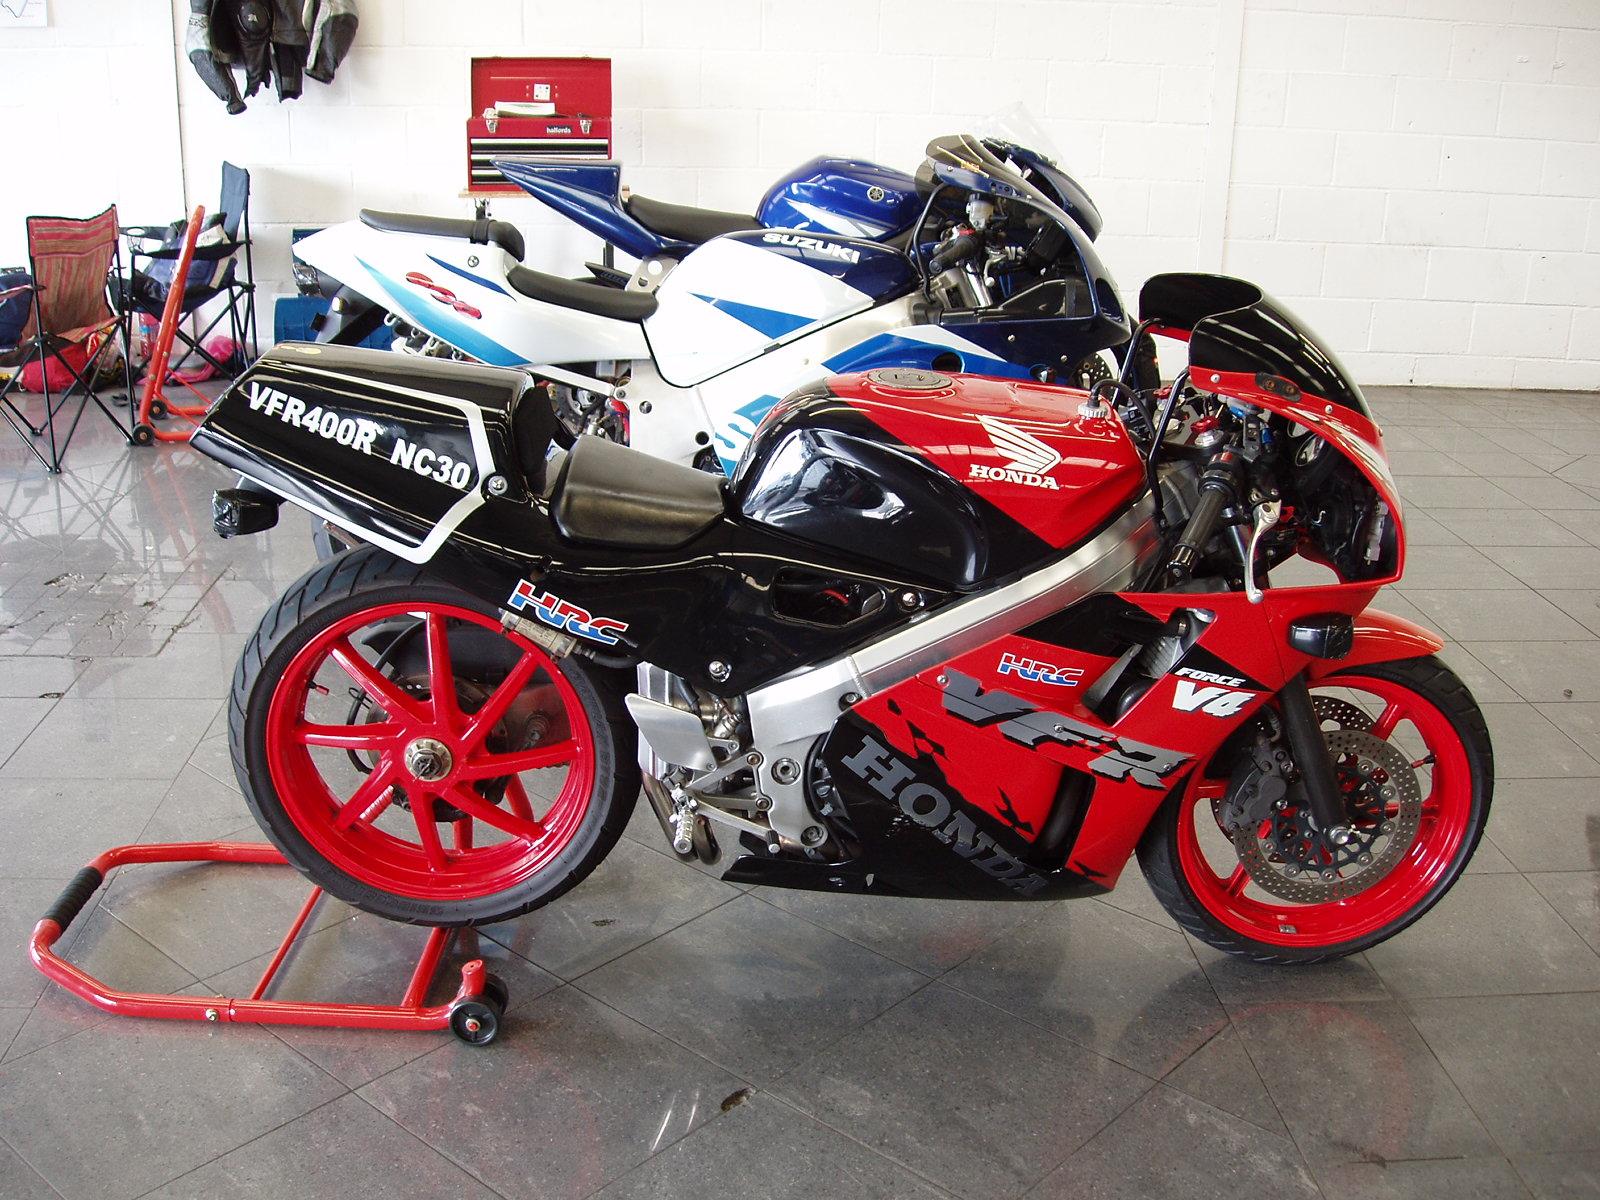 The Honda 400 at MotorBikeSpecs.net, the Motorcycle ...